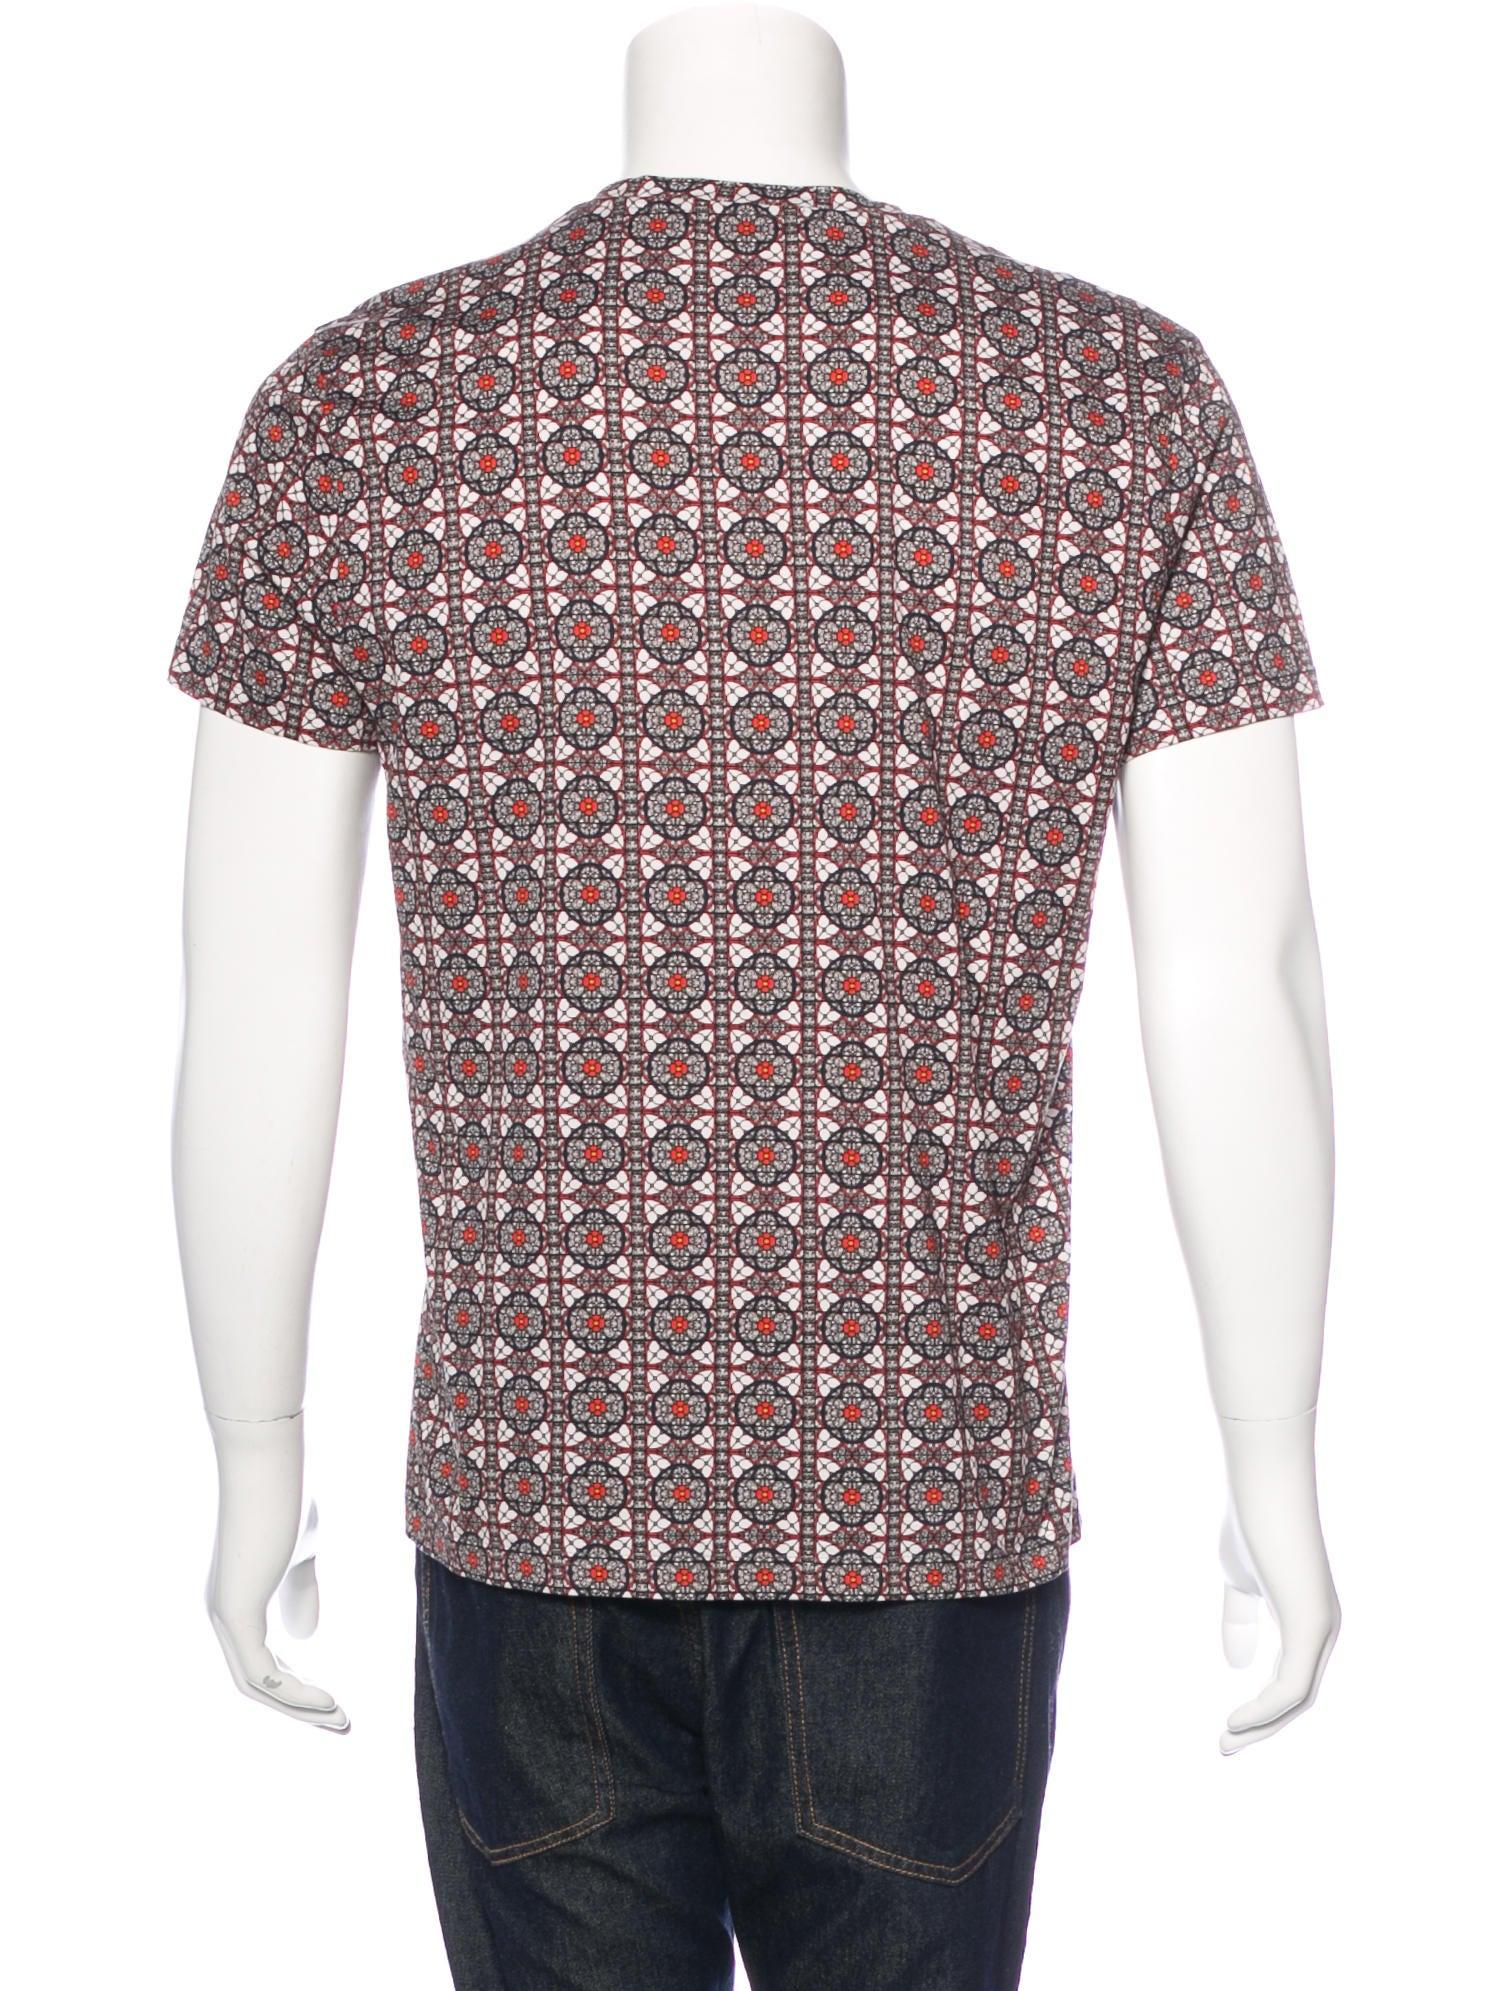 Alexander McQueen Geometric Skull Print T-Shirt - Clothing ...